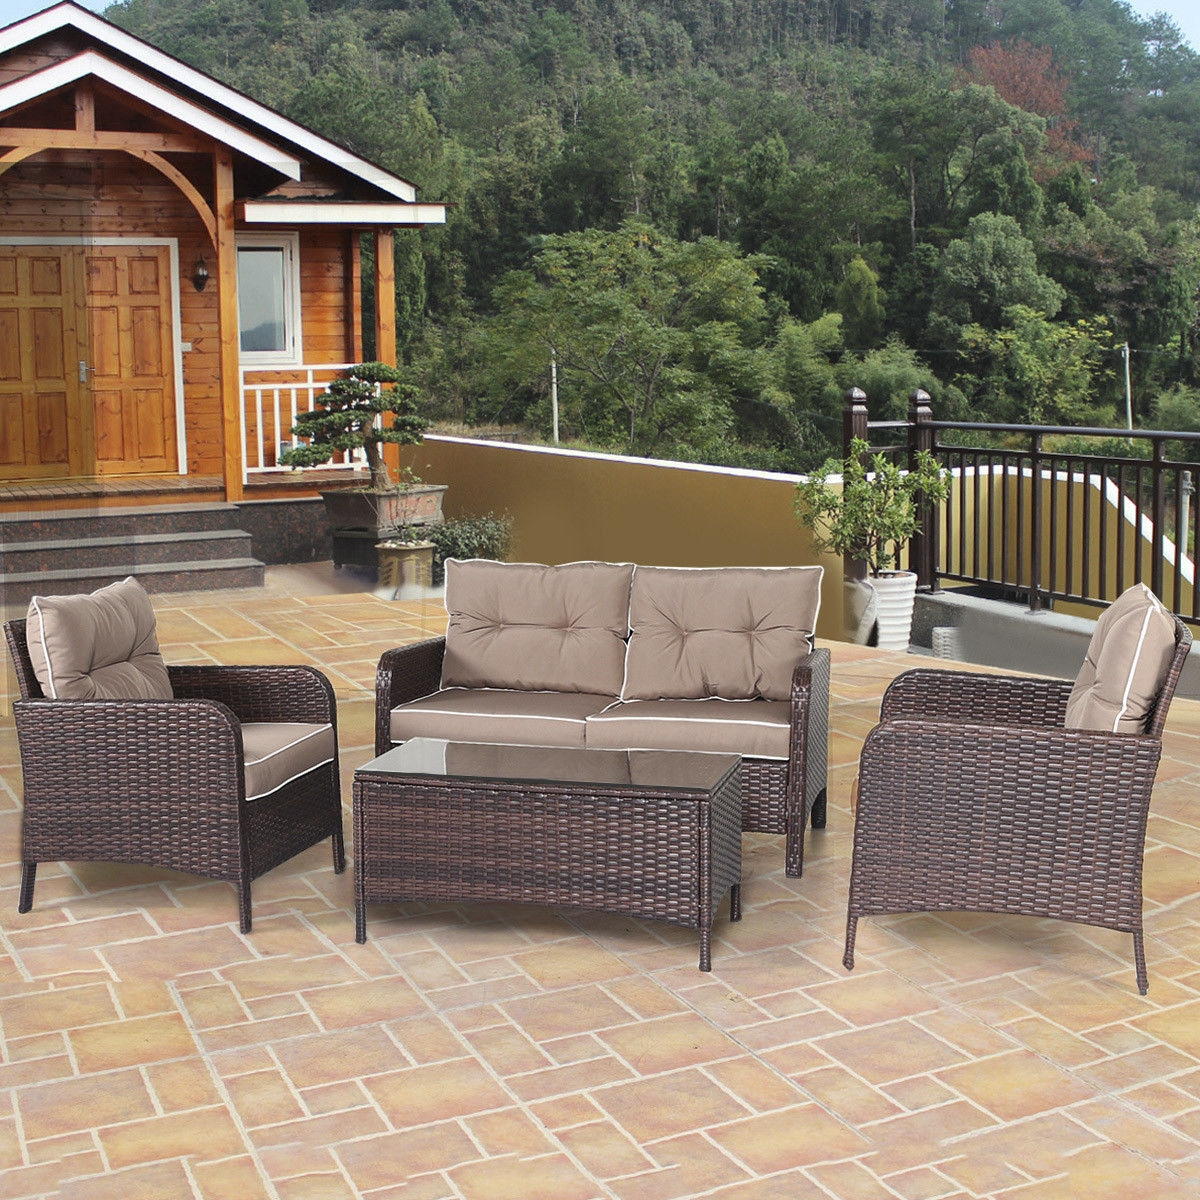 4 pcs Outdoor Rattan Wicker Loveseat Furniture Set w/ Cushions-Coffee